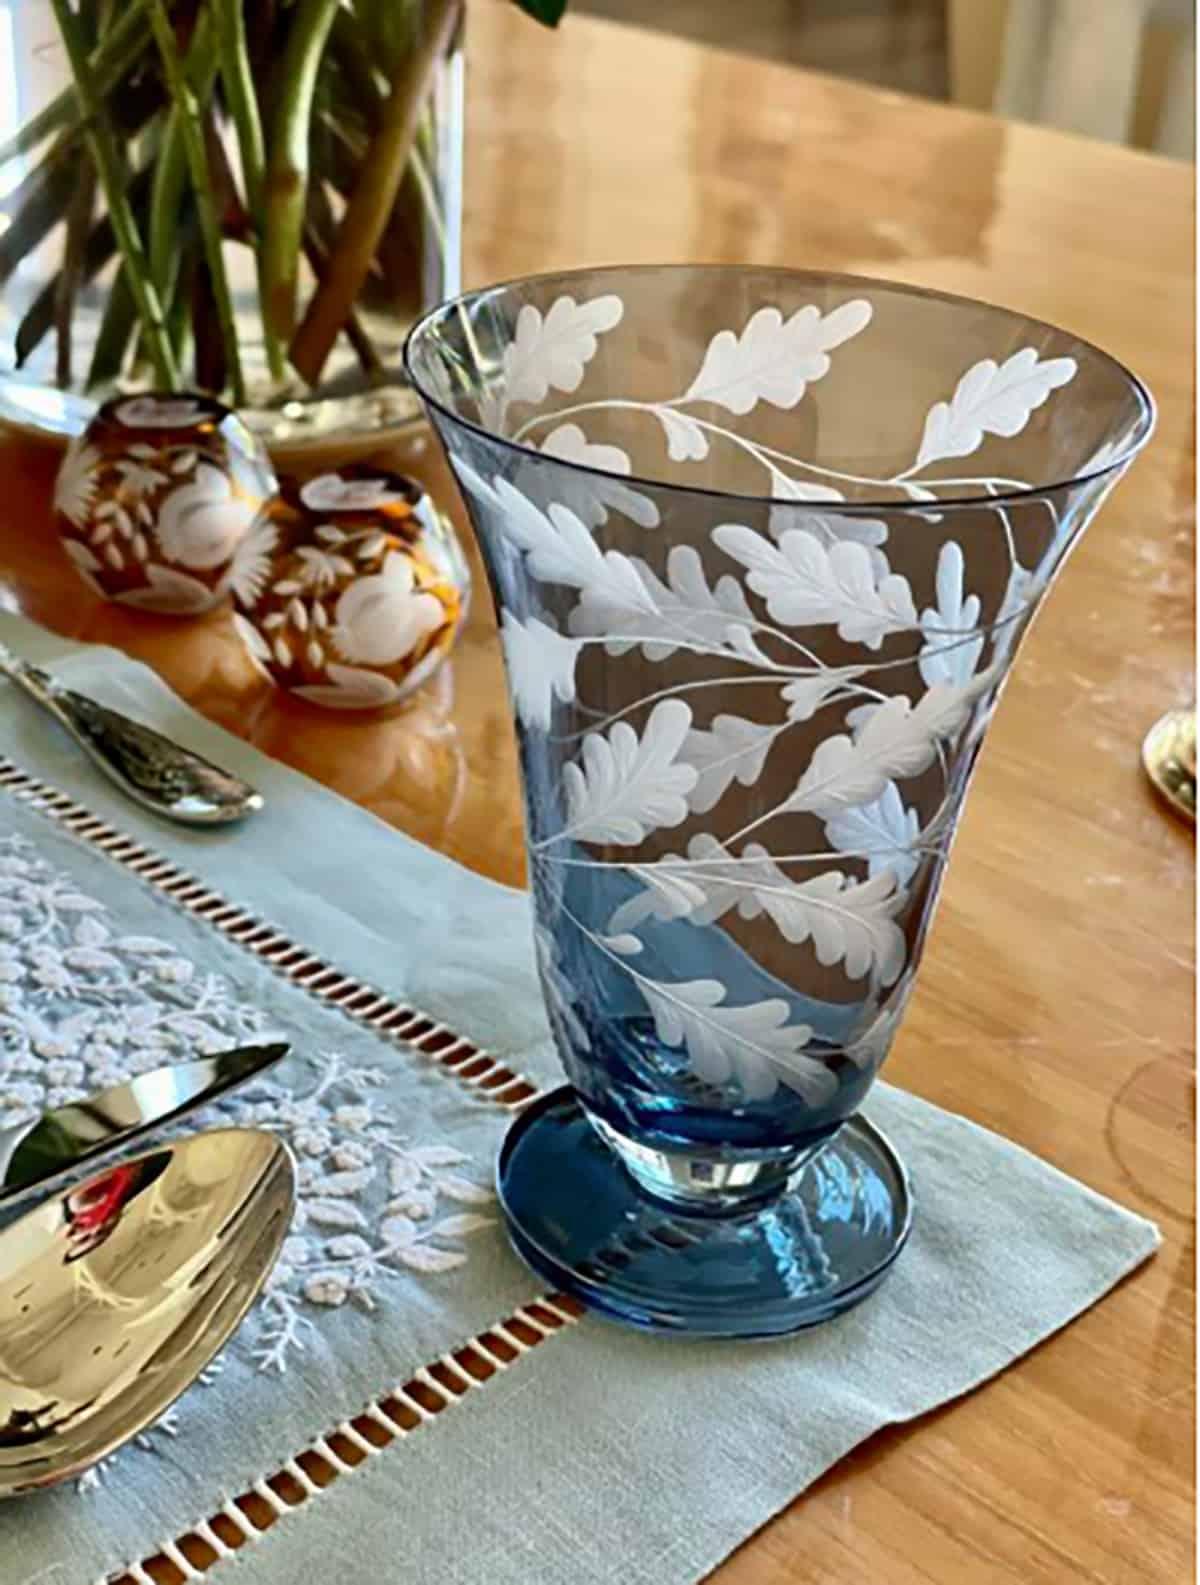 Hand-engraved stemless Oak Leaves goblets by Artel, $190. At ShopKSW.com